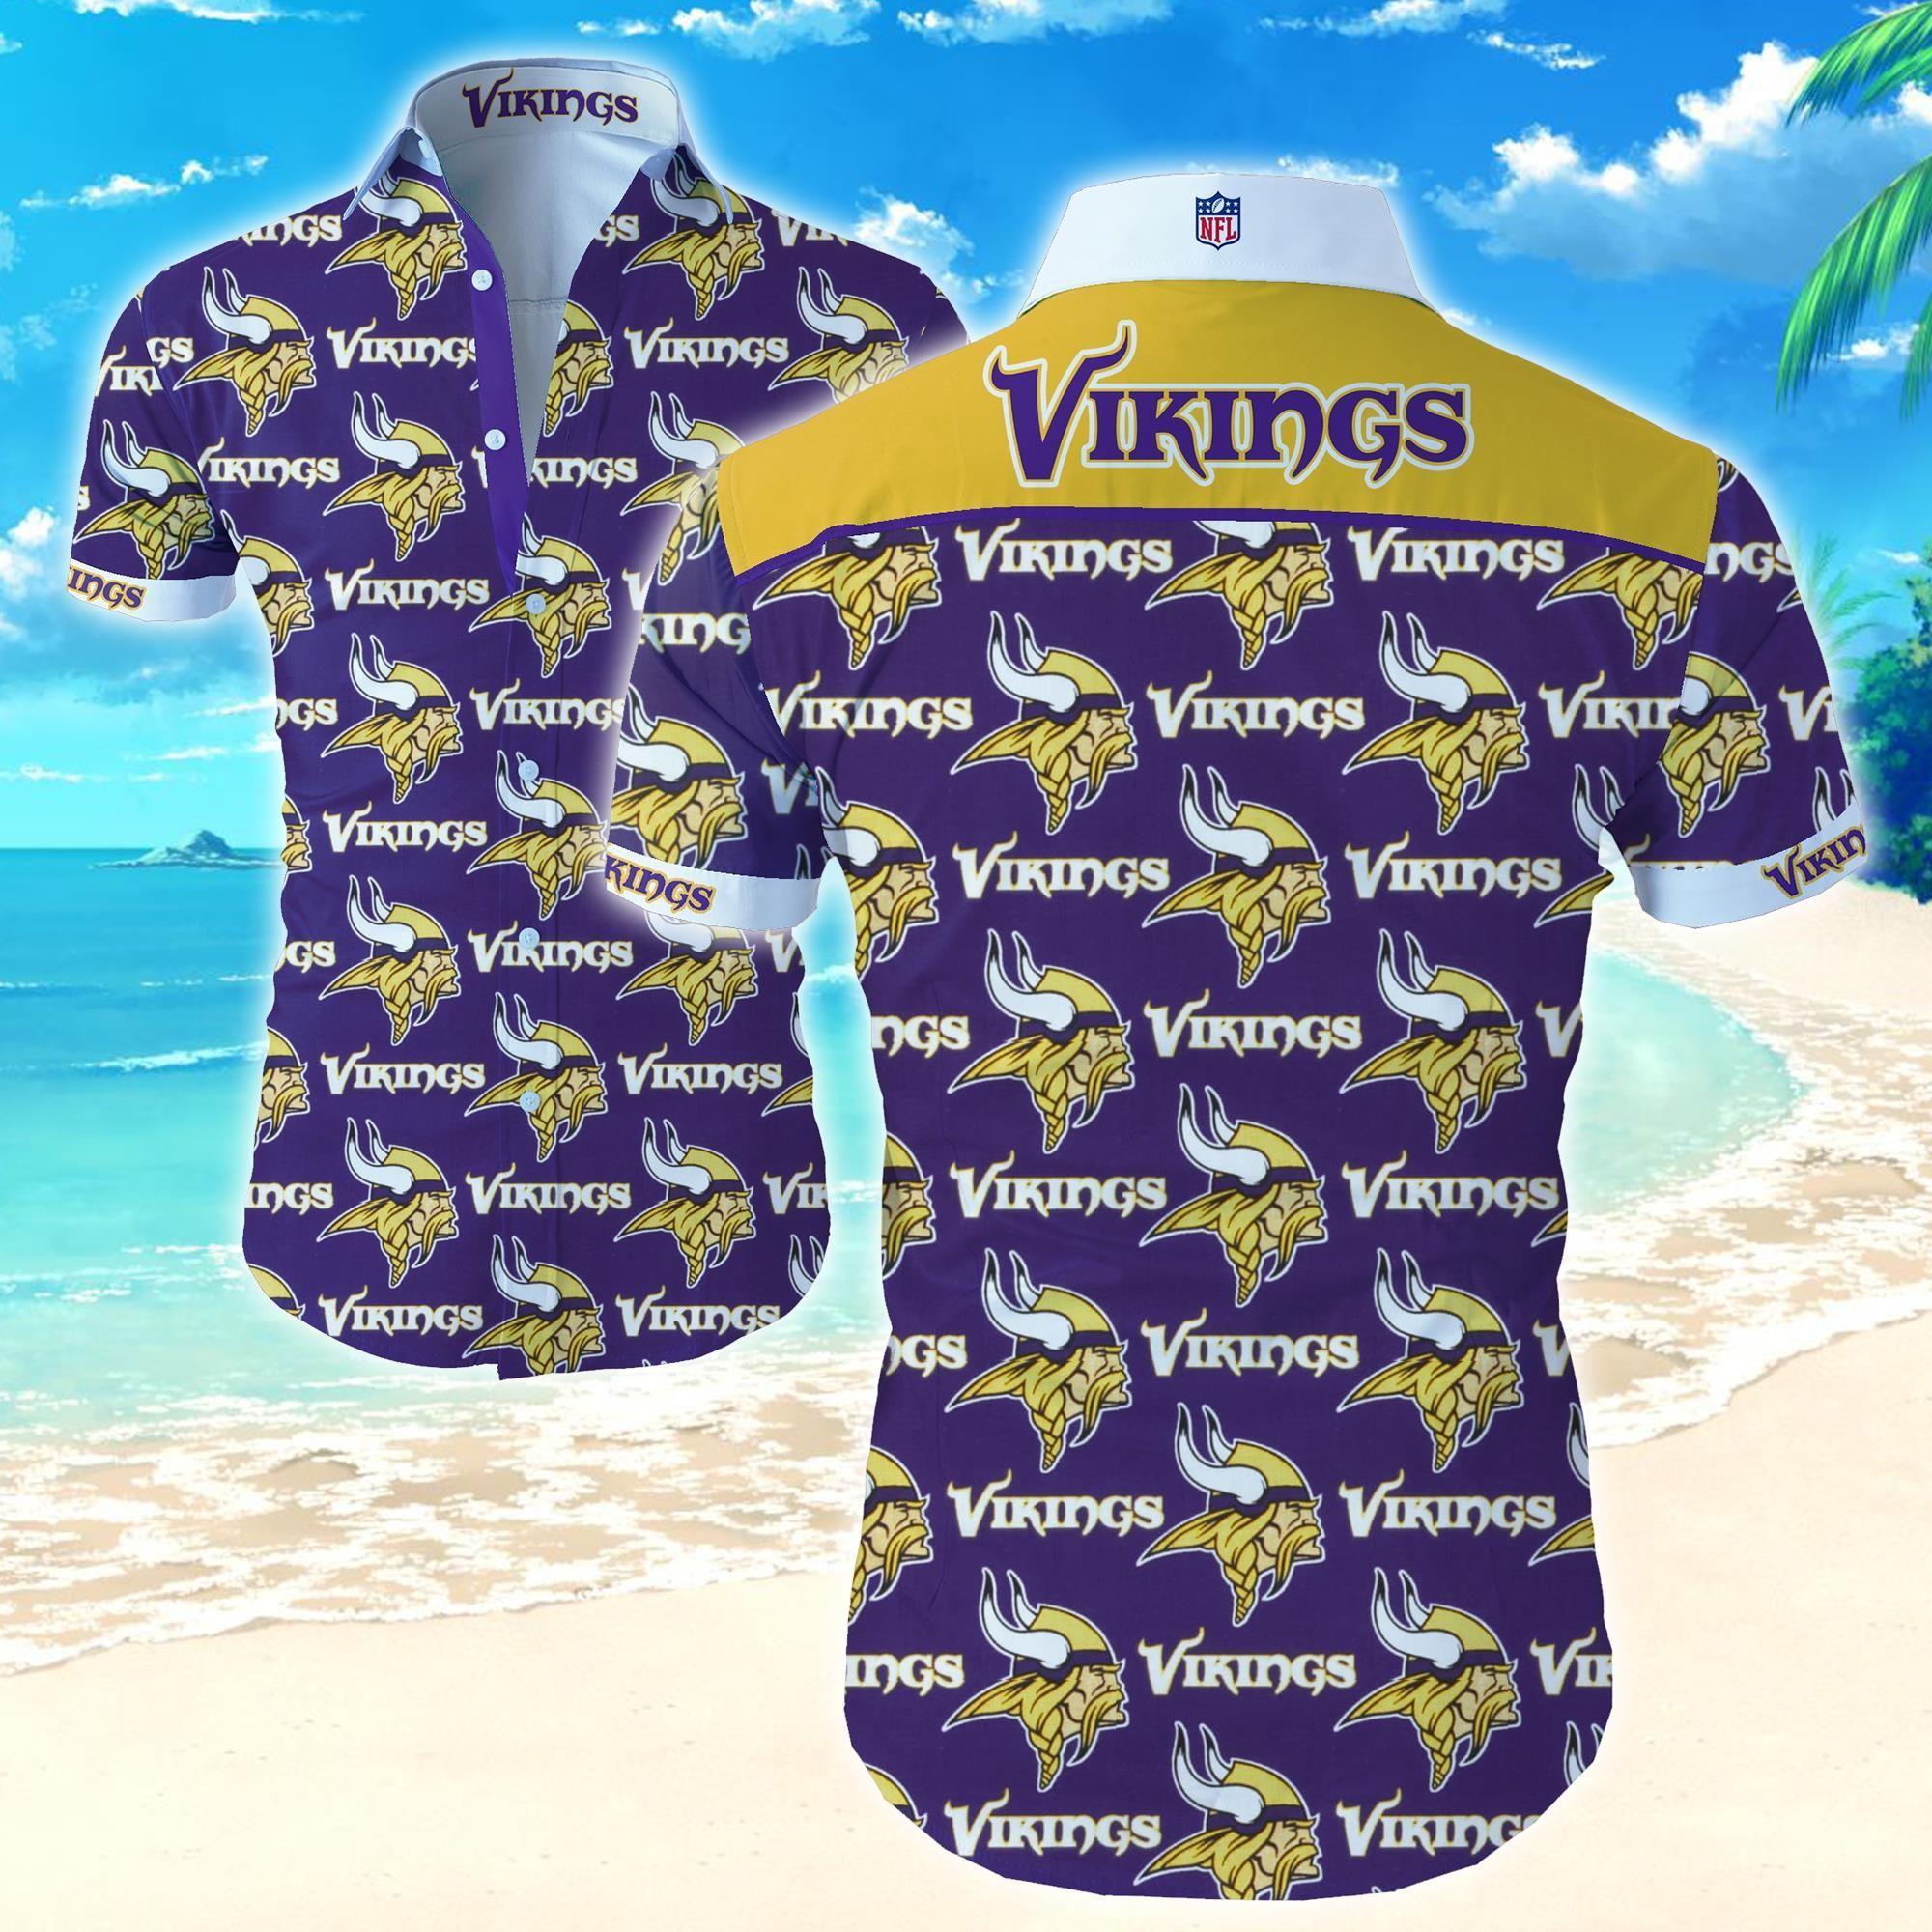 Nfl Minnesota Vikings Special Hawaiian Shirt for fan